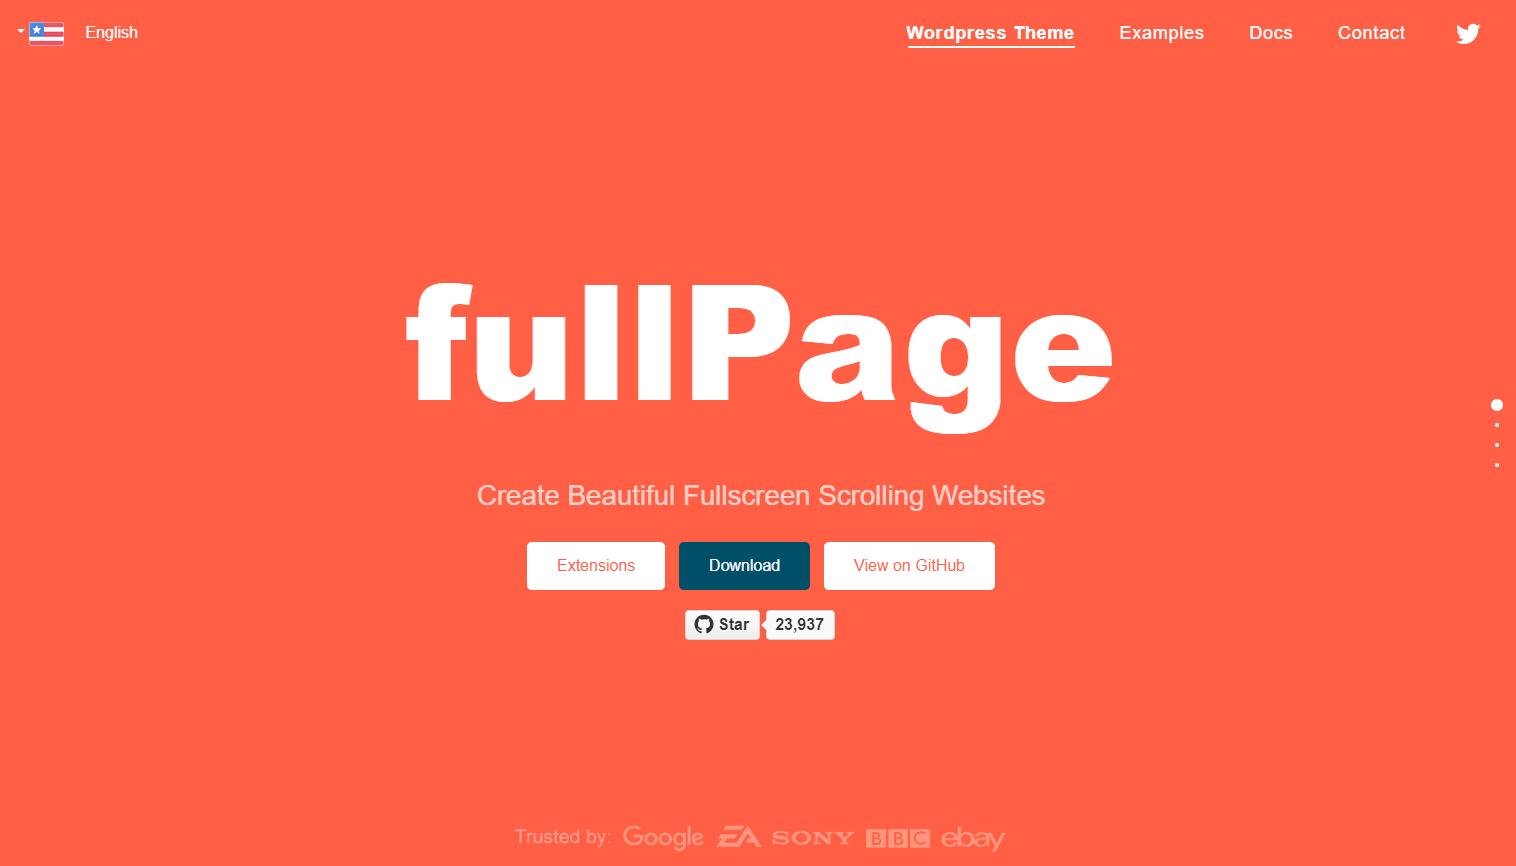 WordPressの「全幅」=HAIKの「フルページ」